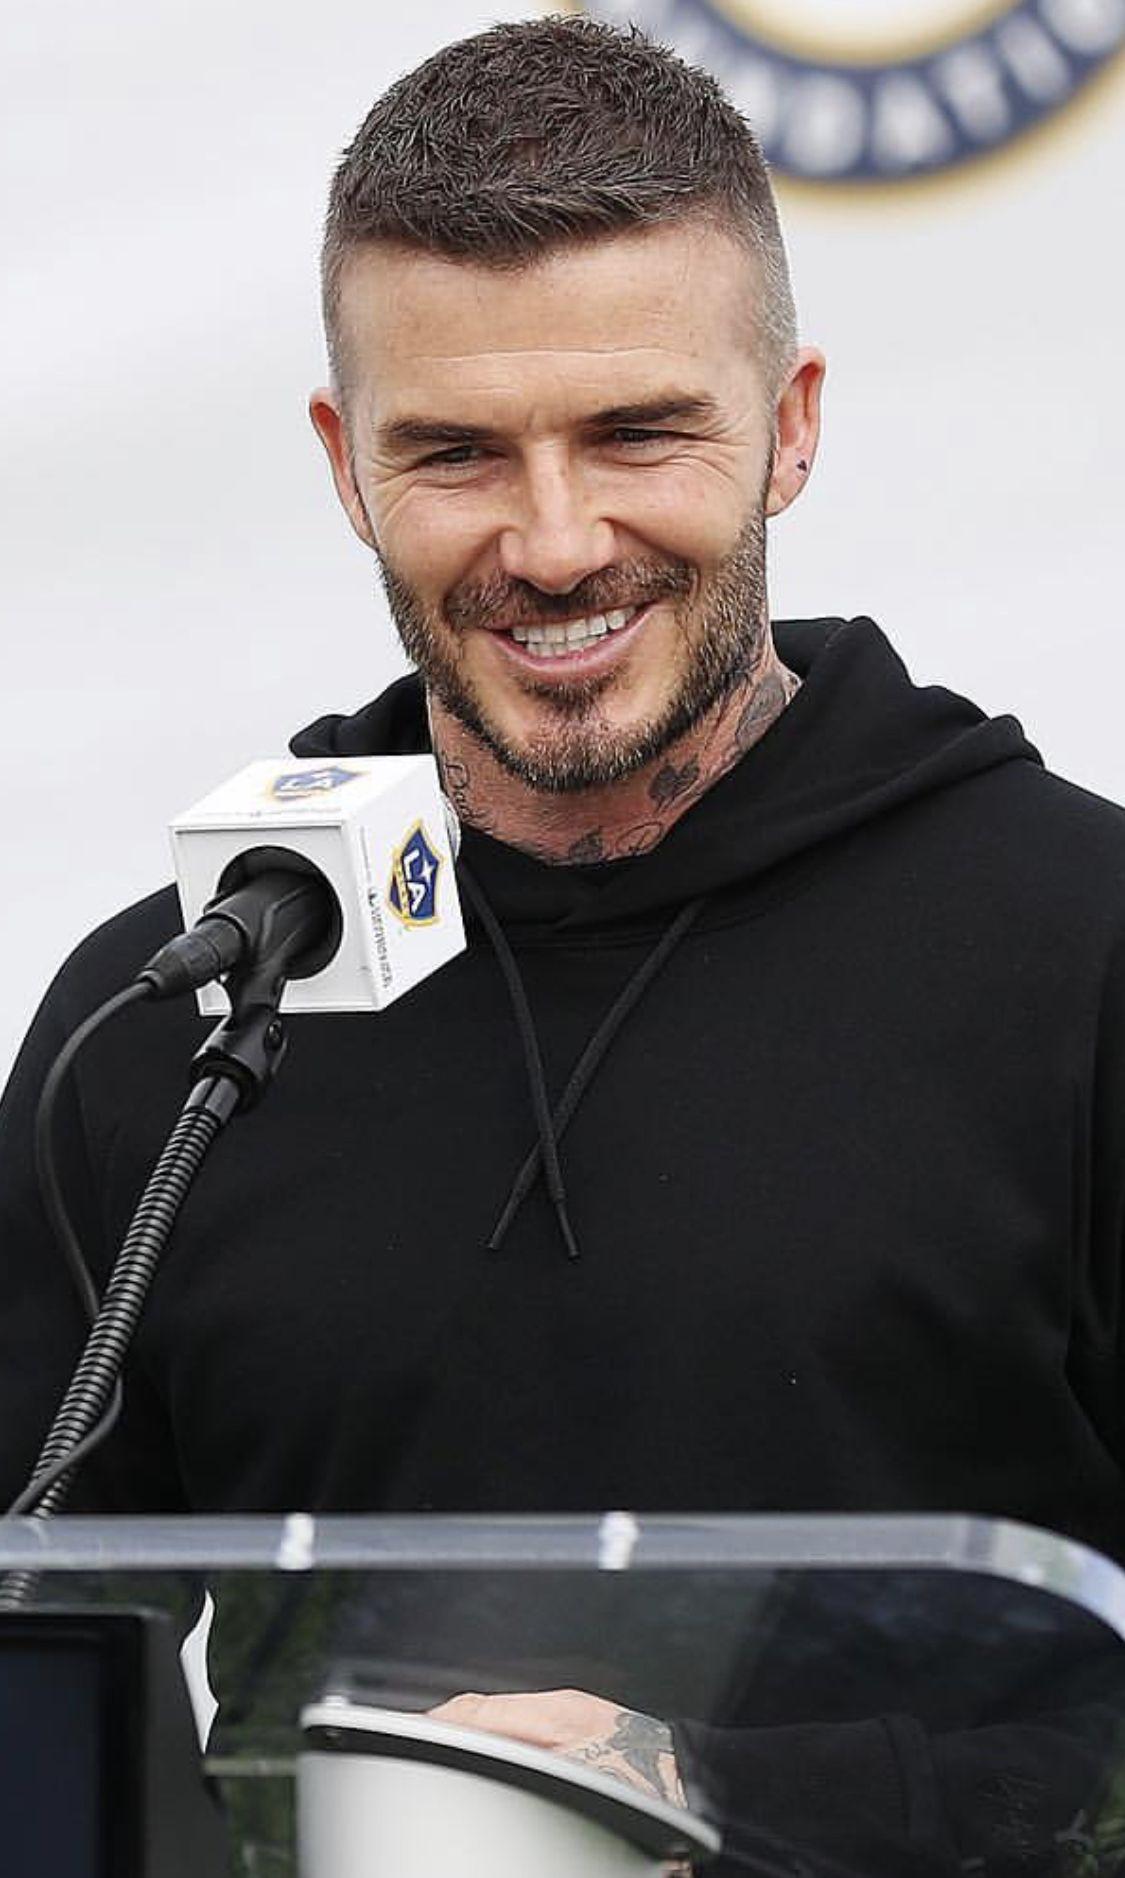 Pin by David Beckham on David Beckham  Mens hairstyles short